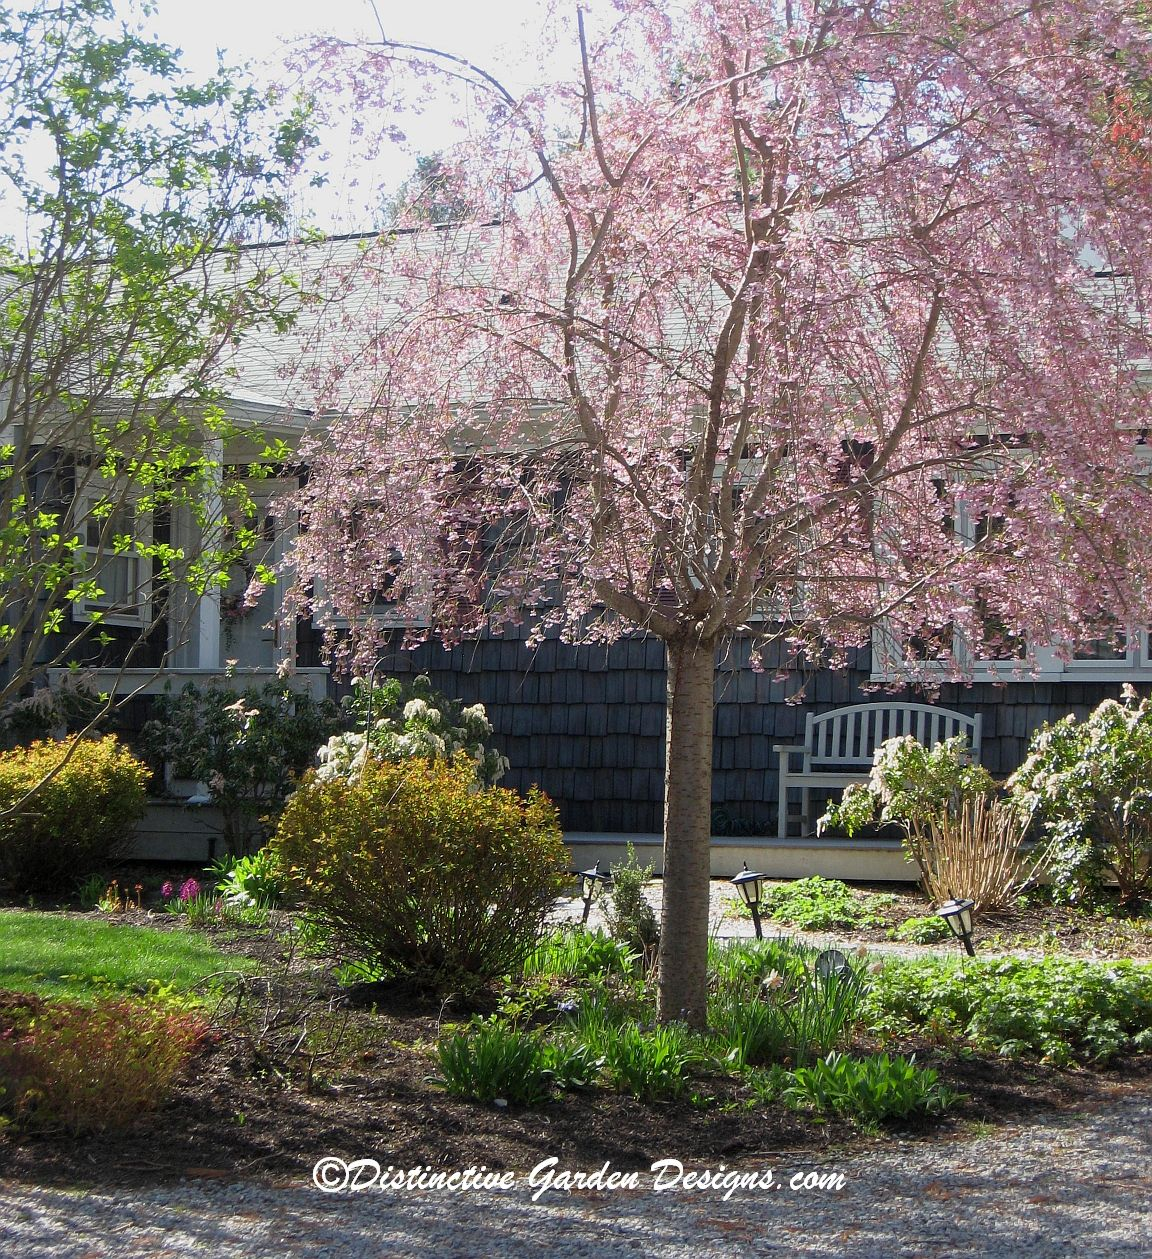 Garden Ideas Designs And Inspiration: Weeping Cherry Via Distinctive Garden Designs . Com